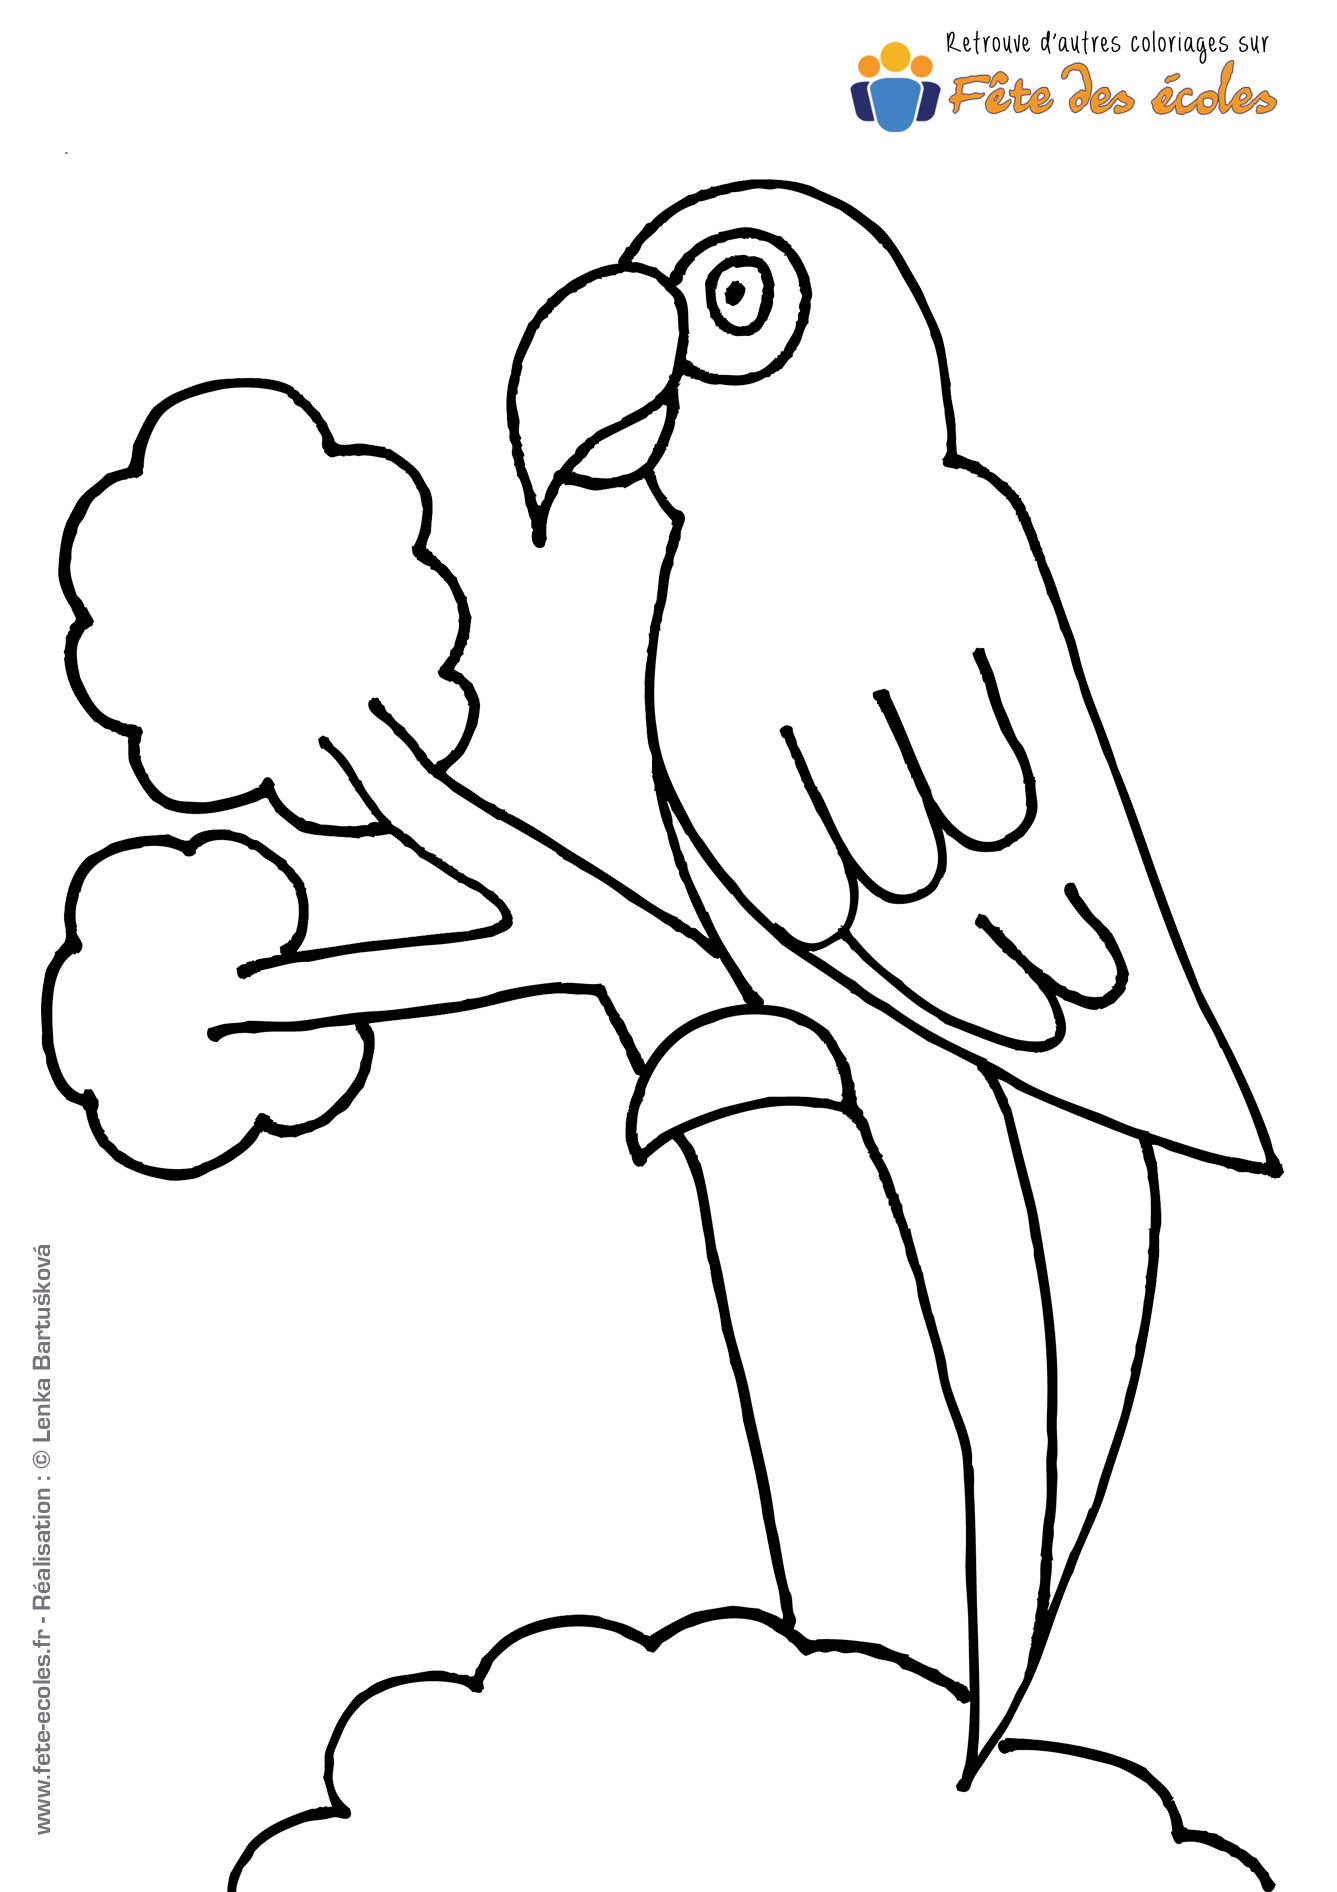 Coloriage perroquet sur sa branche